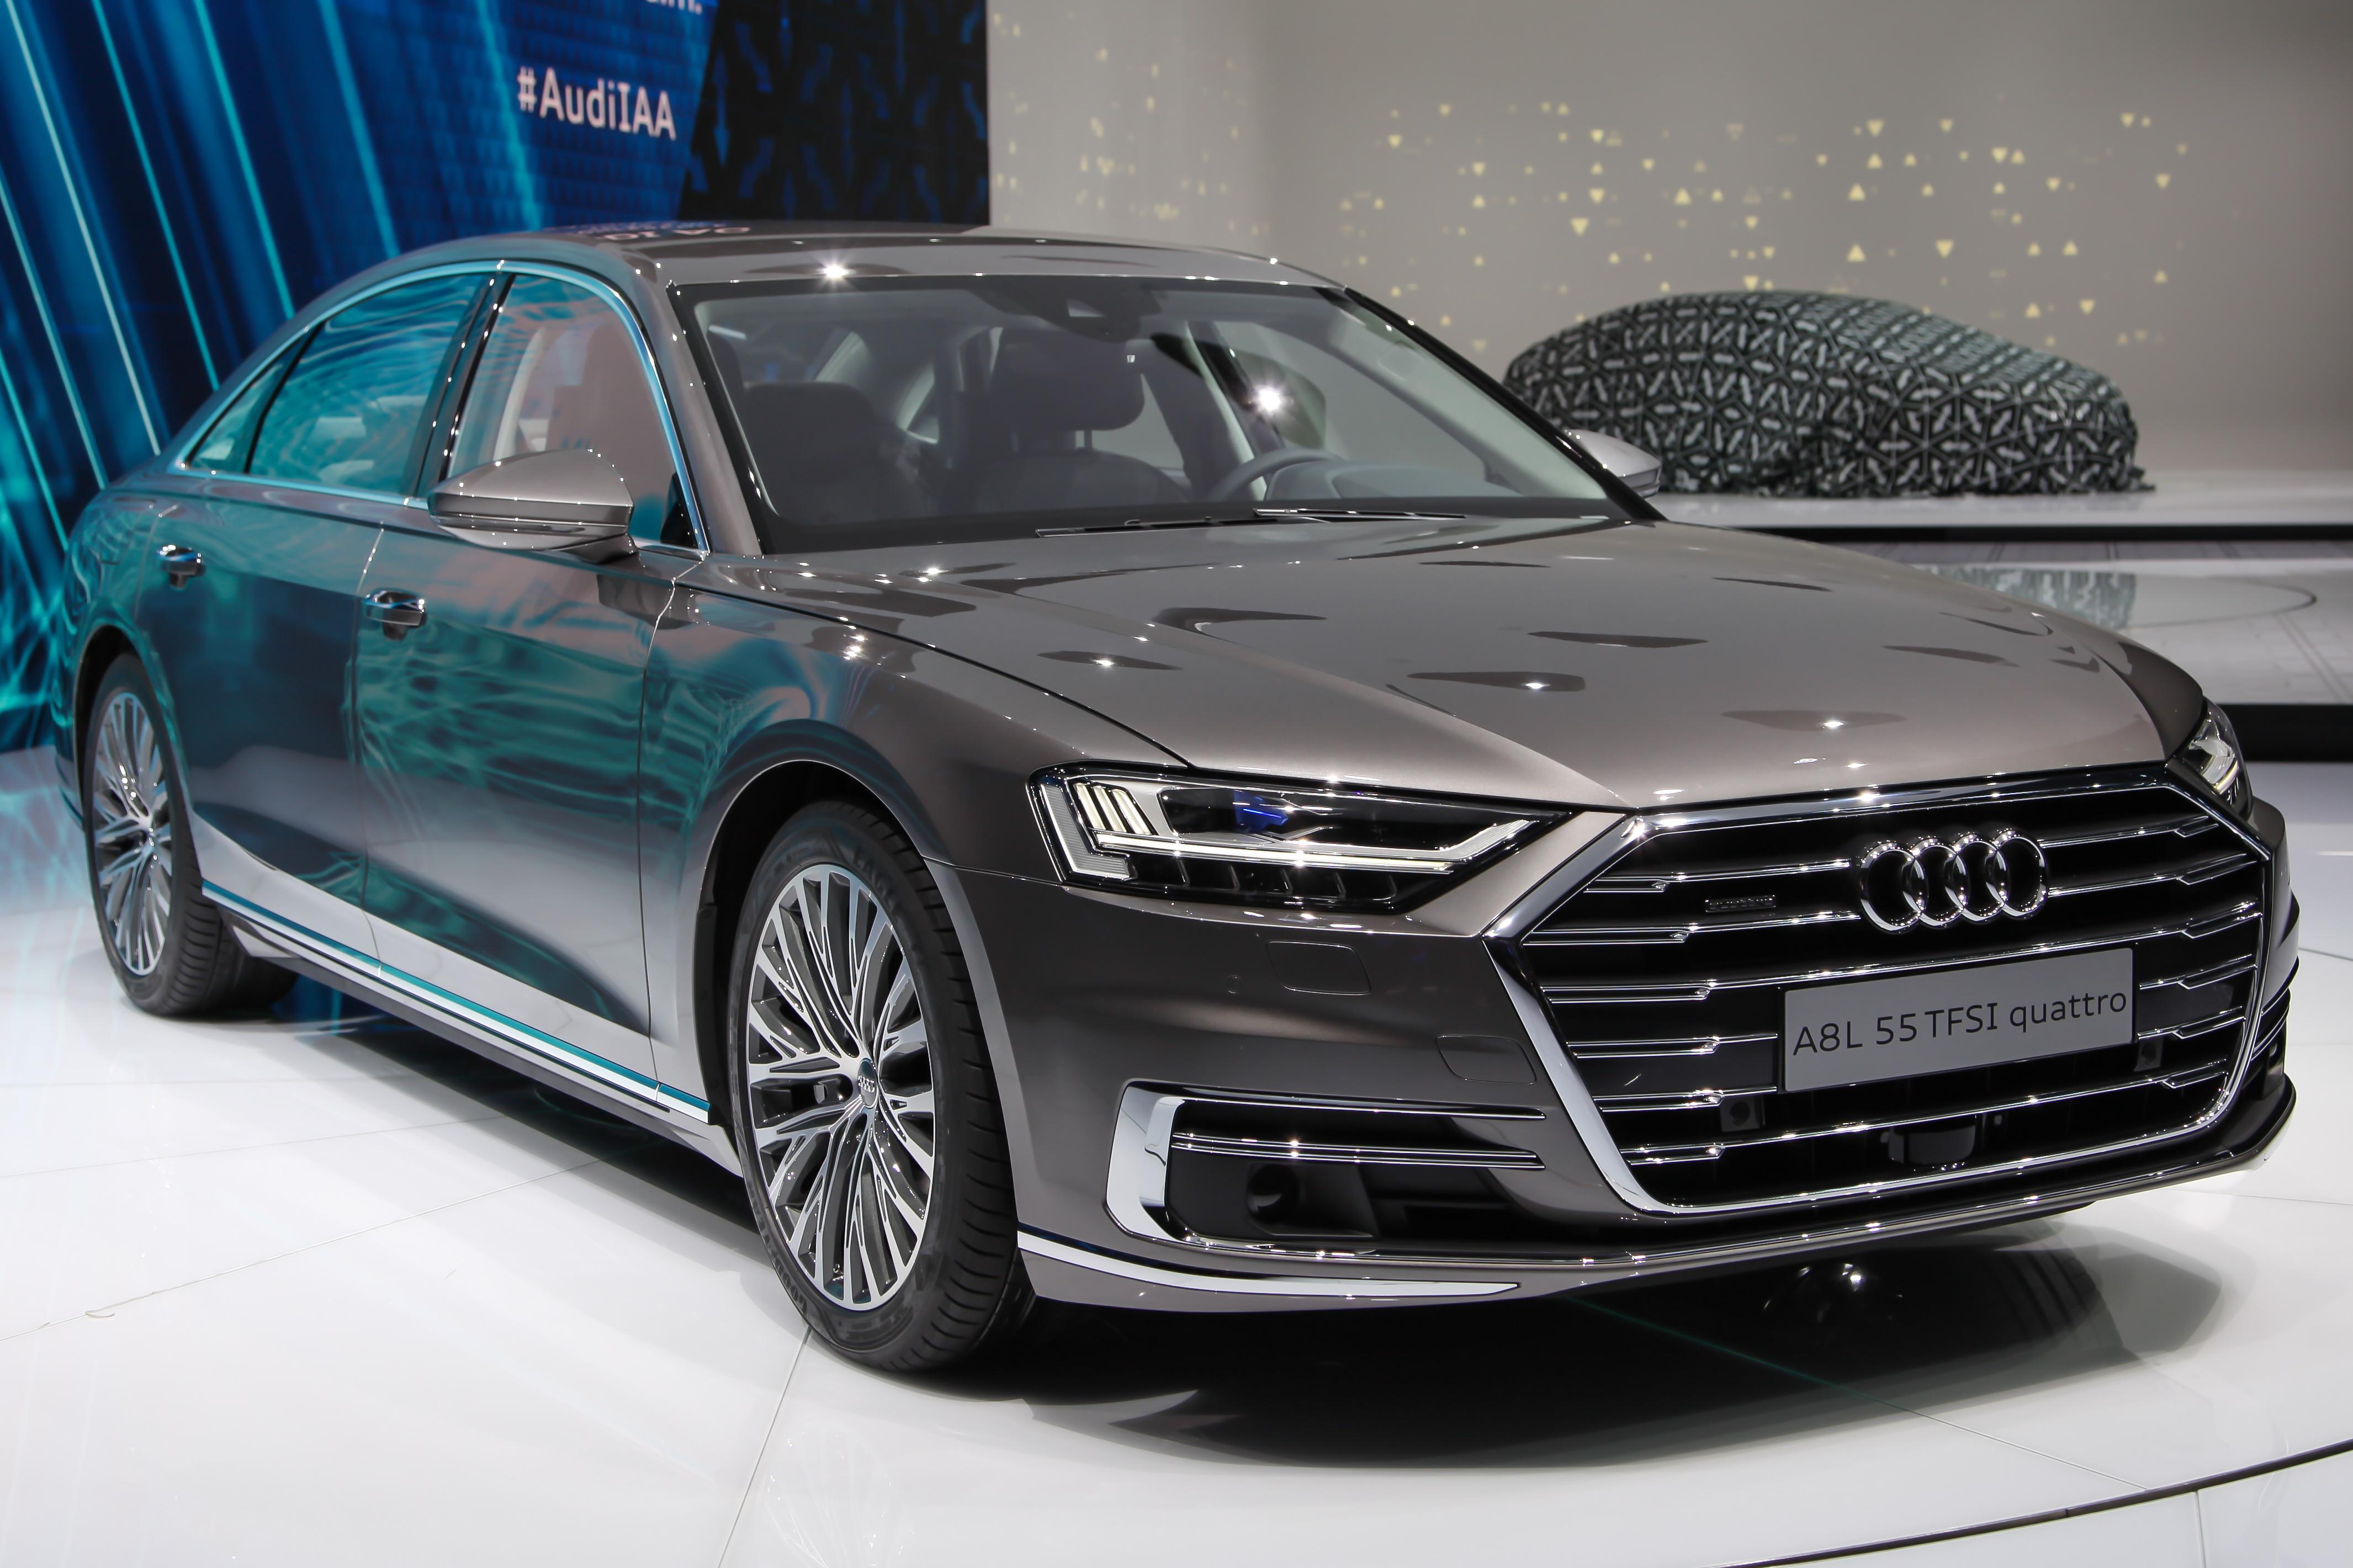 10. Audi A8